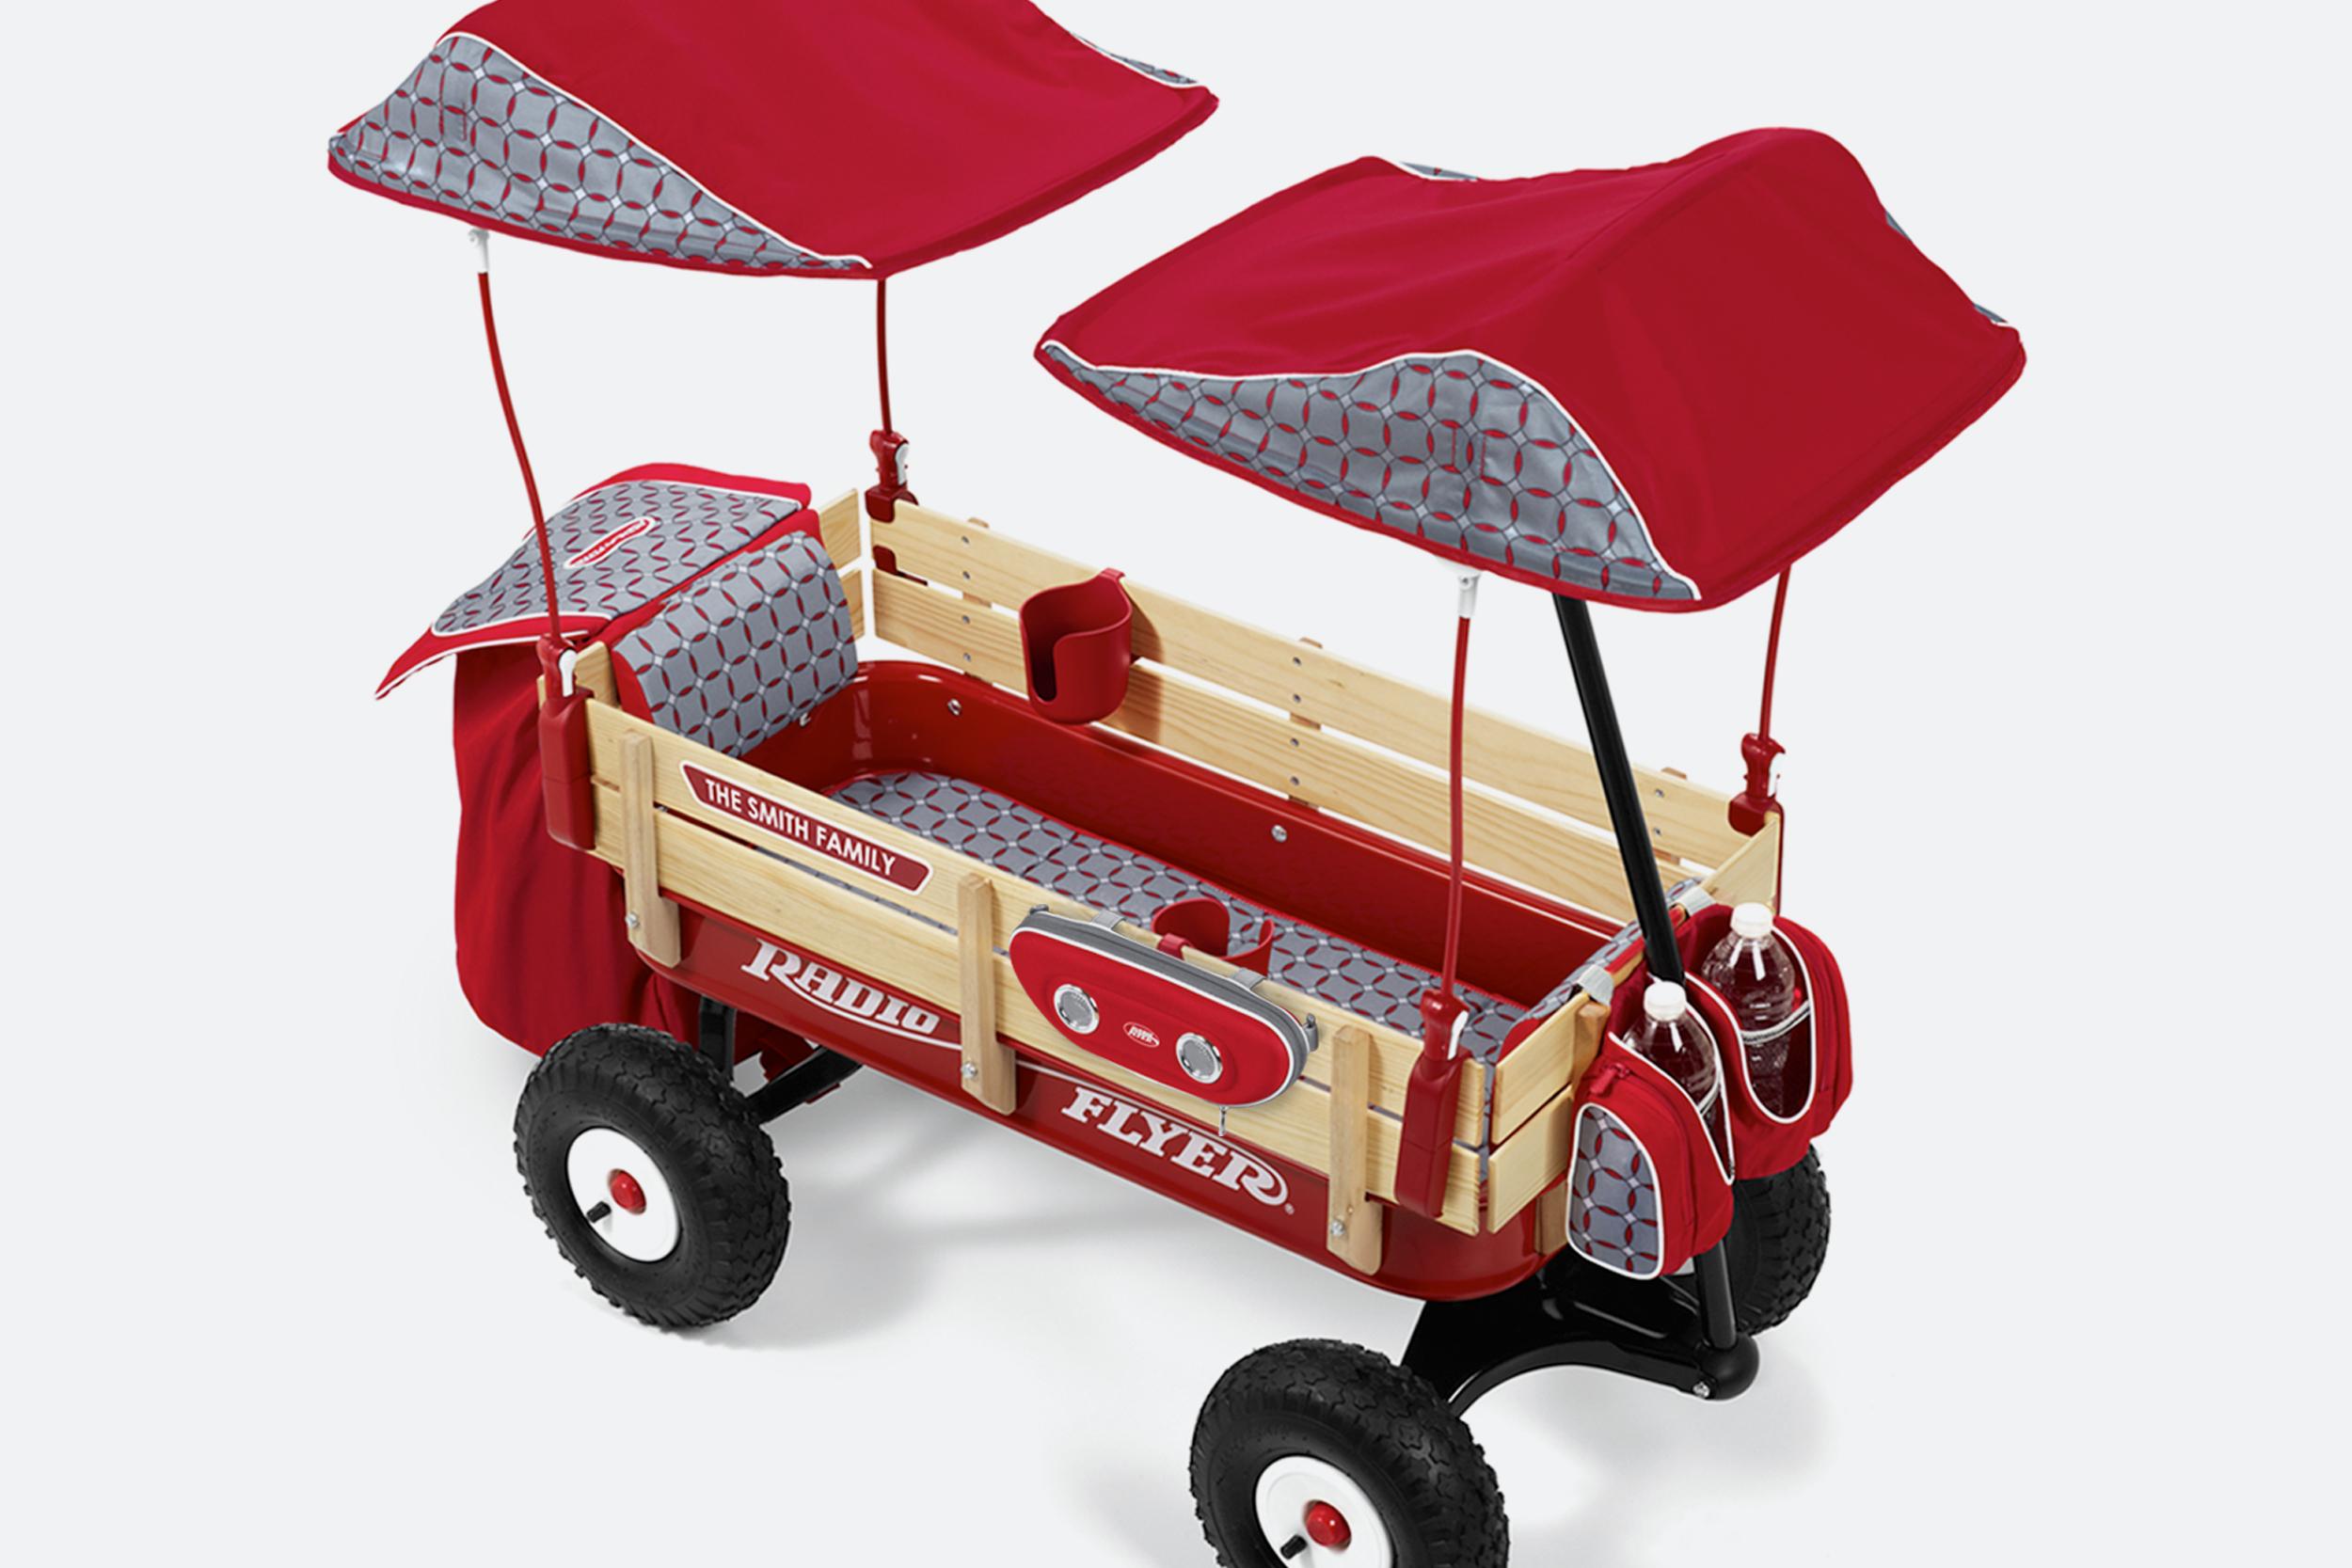 Radio Flyer Build-A-Wagon  |  Customization Program Design